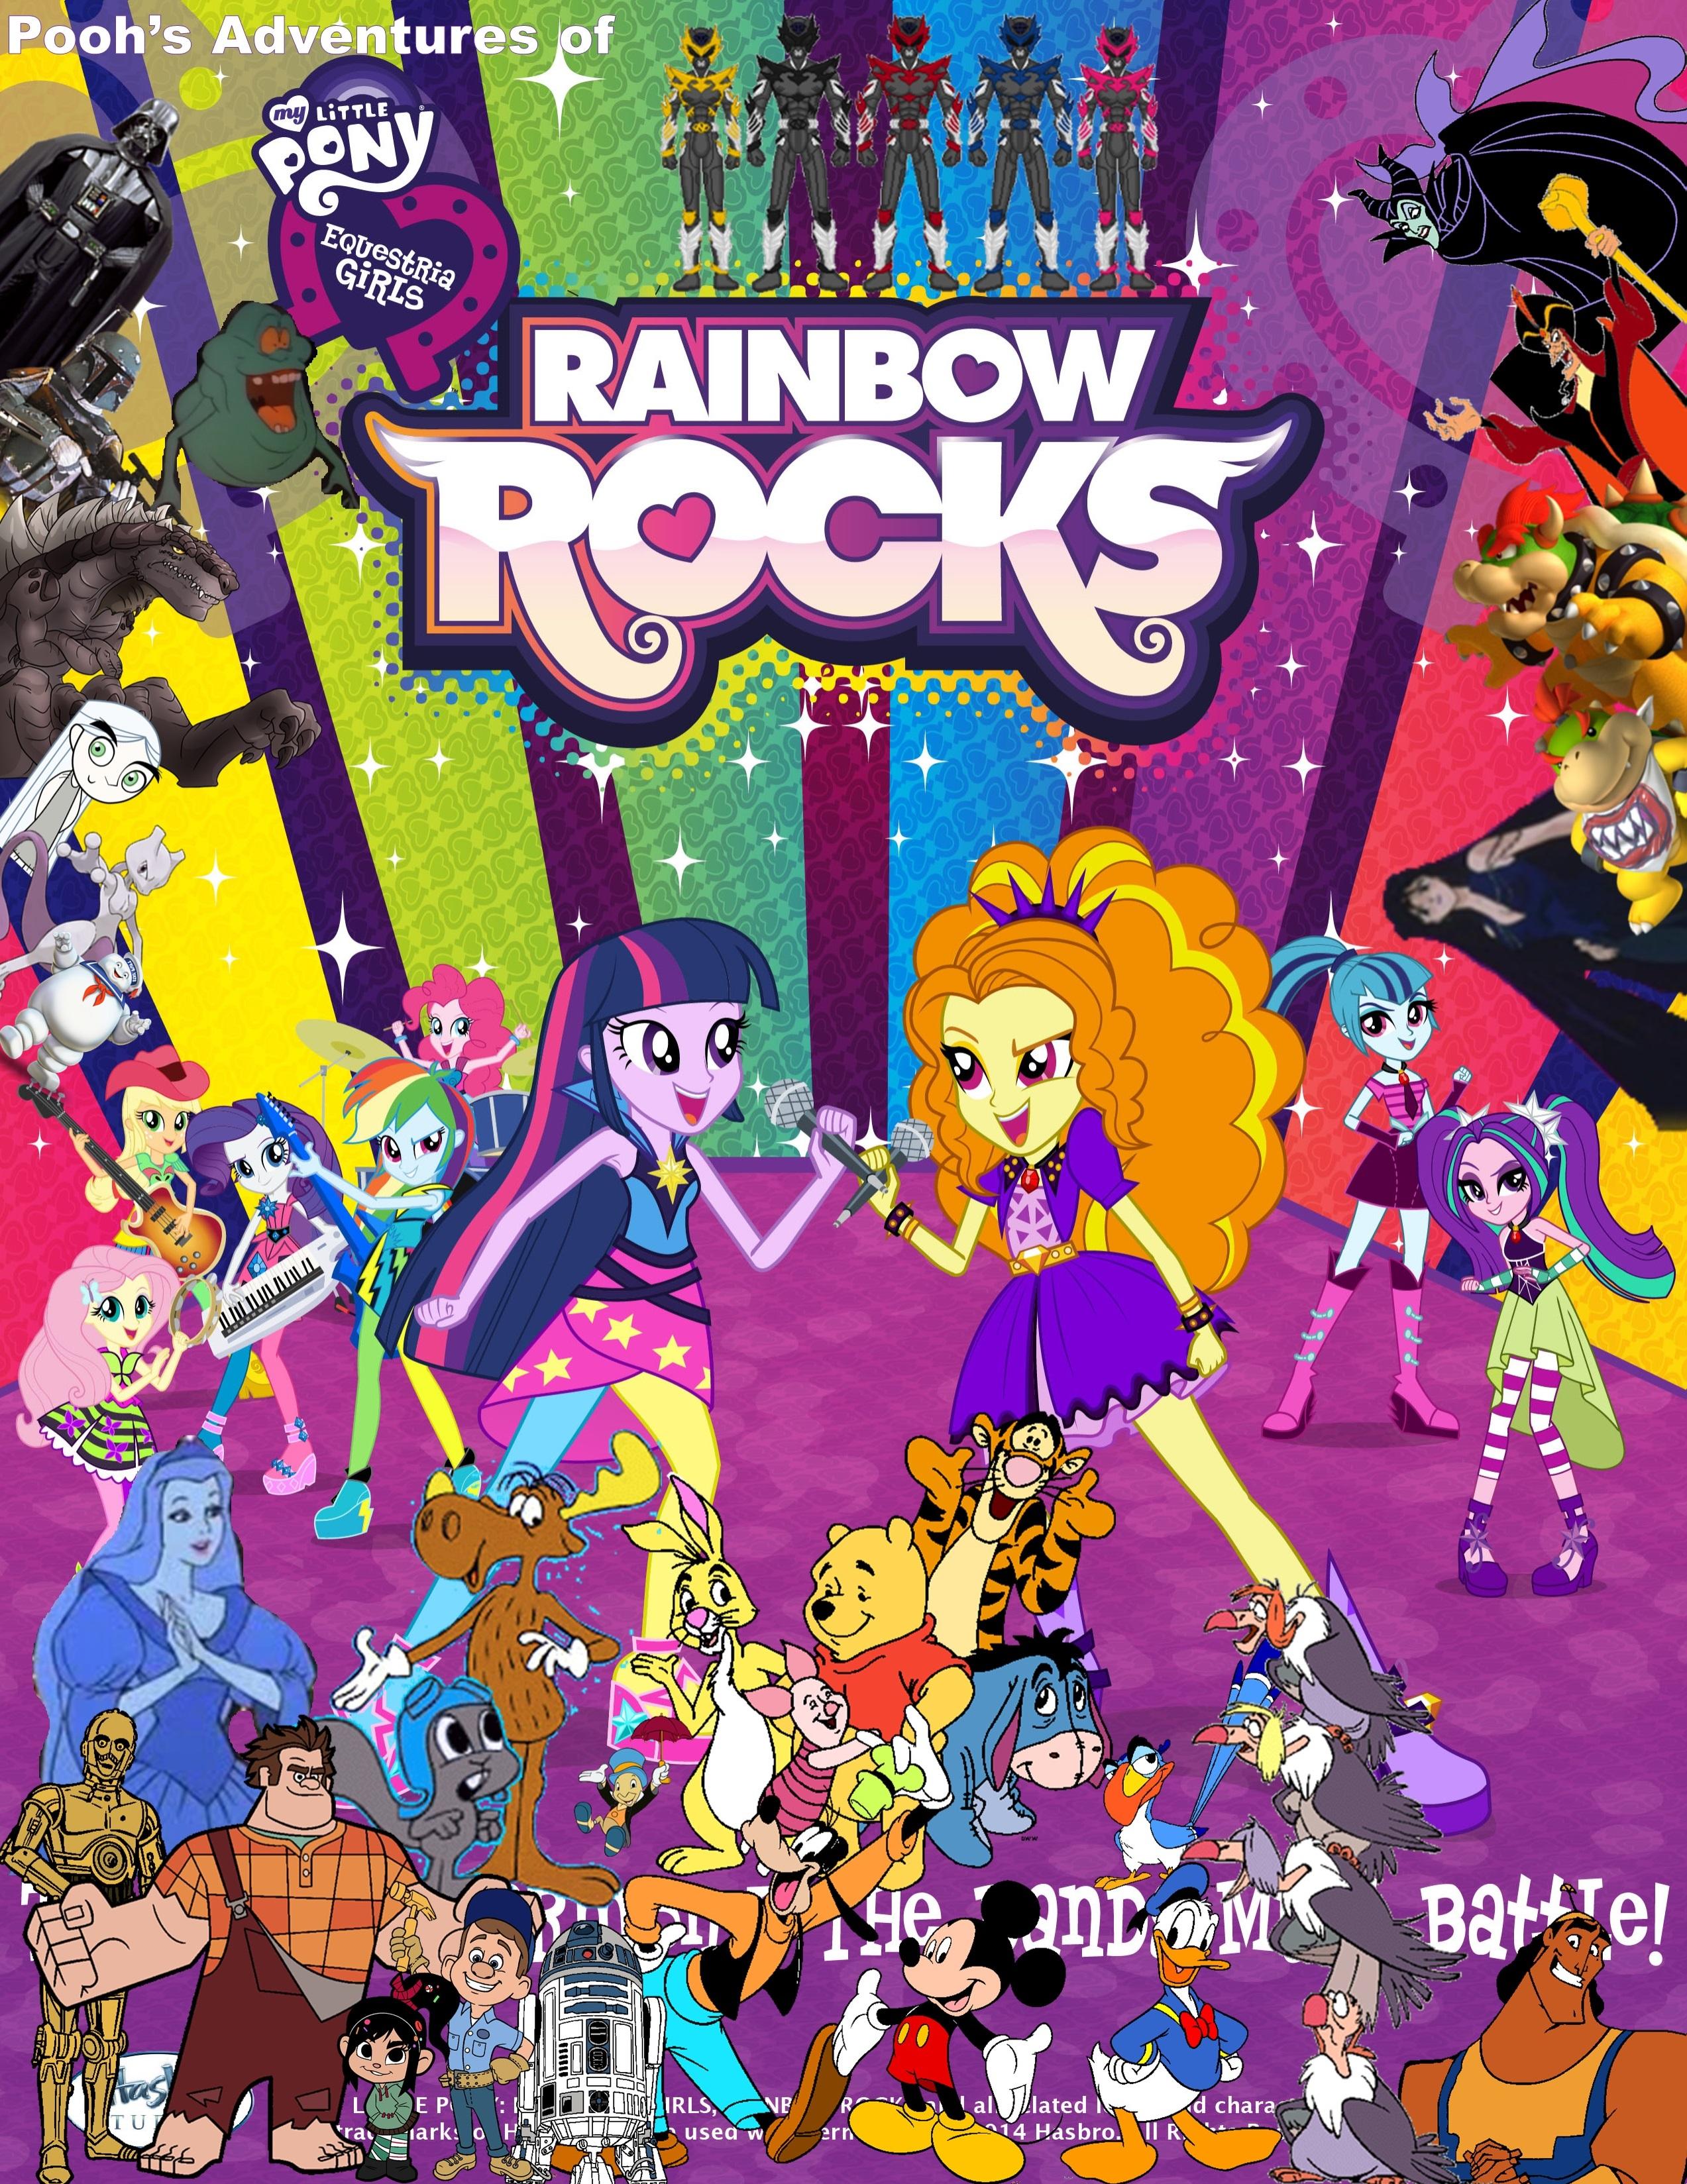 Pooh's Adventures of My Little Pony - Equestria Girls - Rainbow Rocks Poster